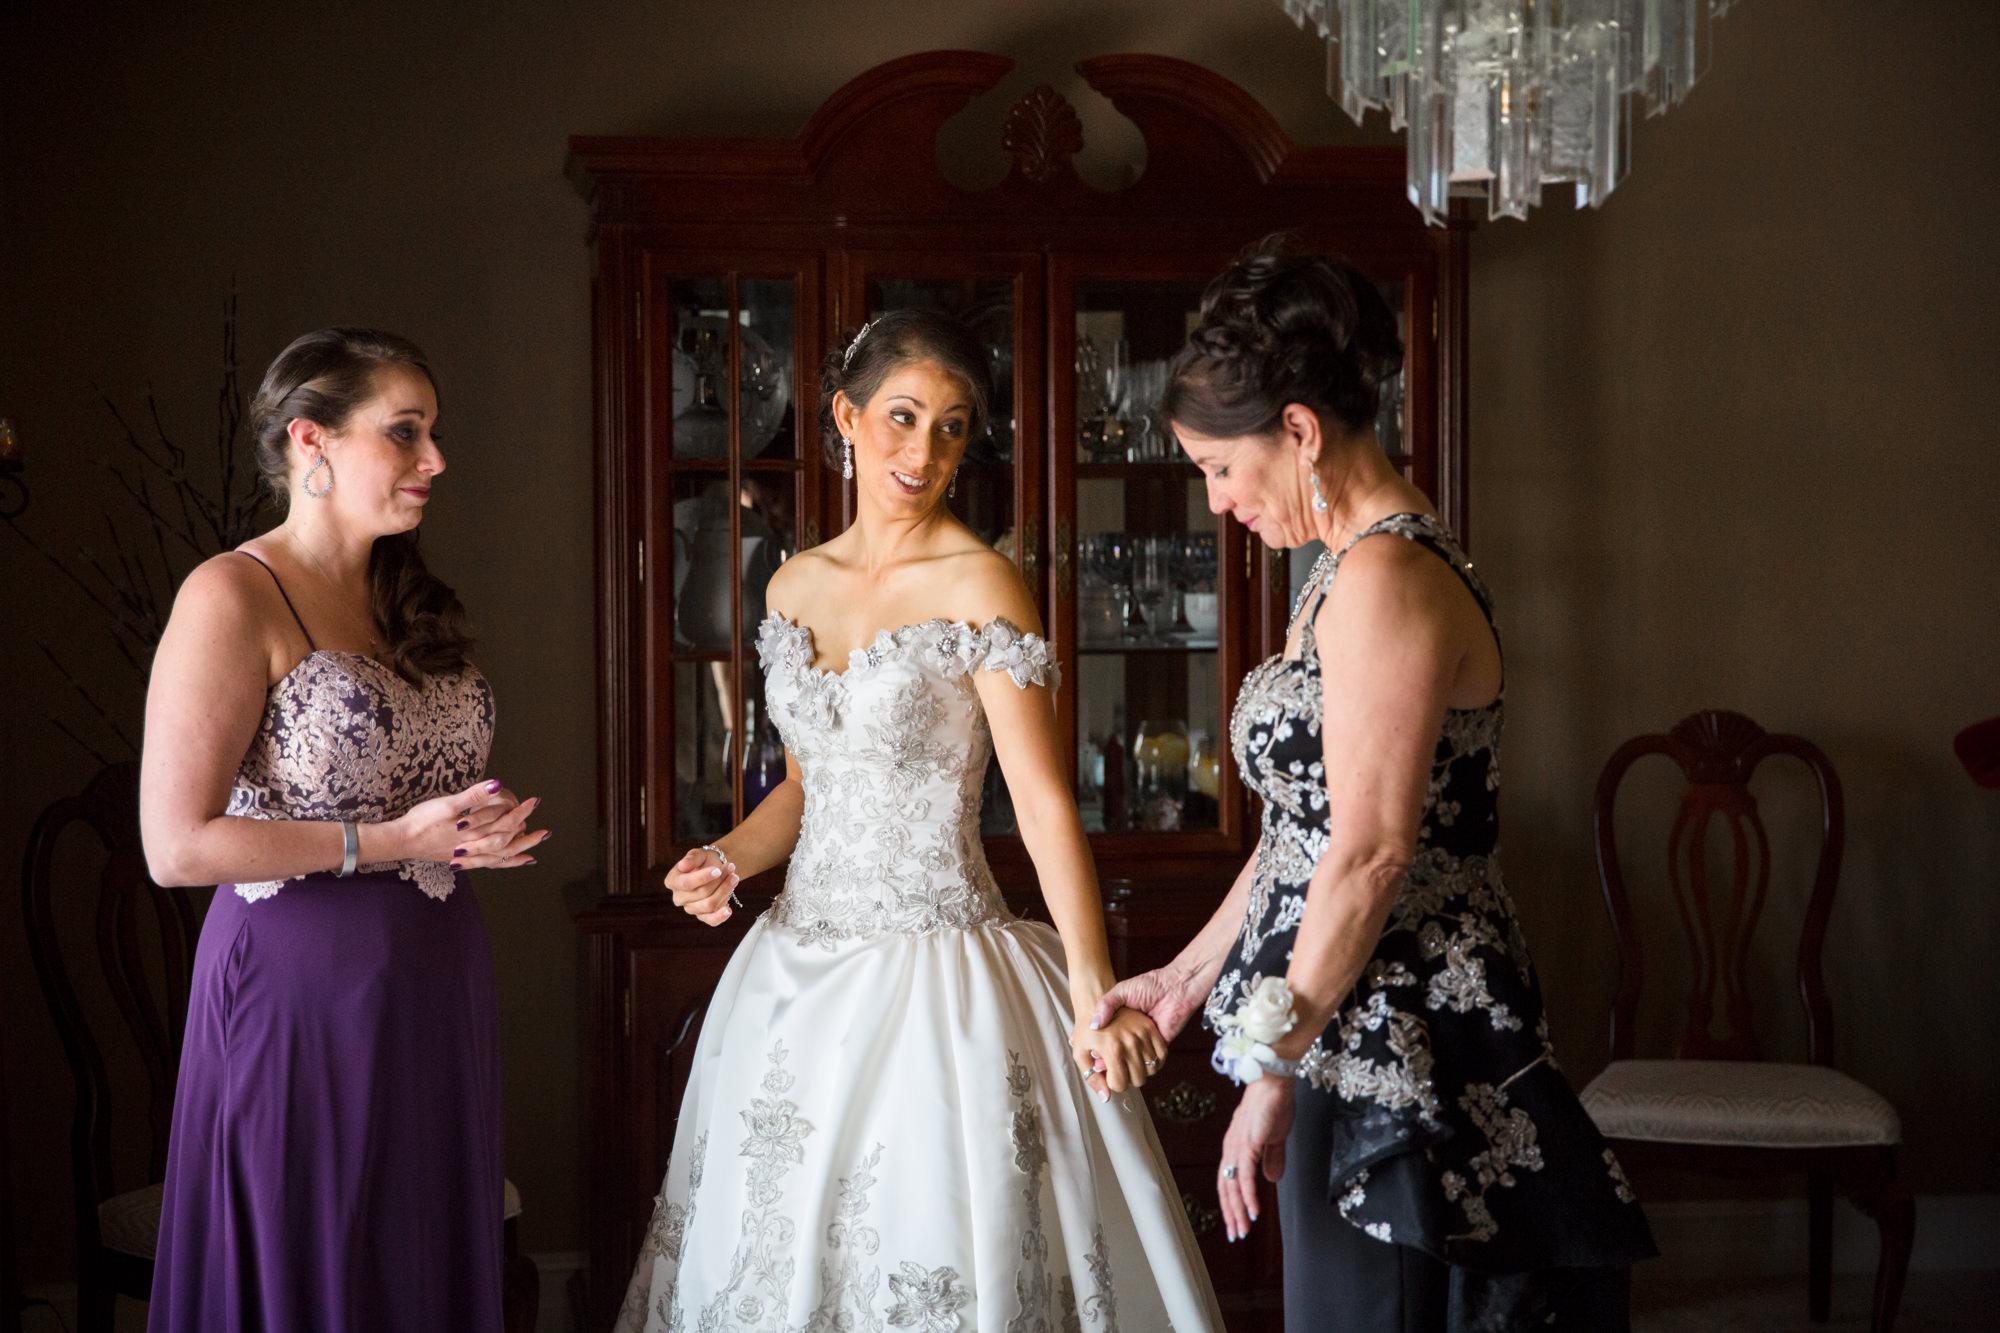 Benvenuto_Wedding_catholic_Florida_Bride-Groom-16.jpg